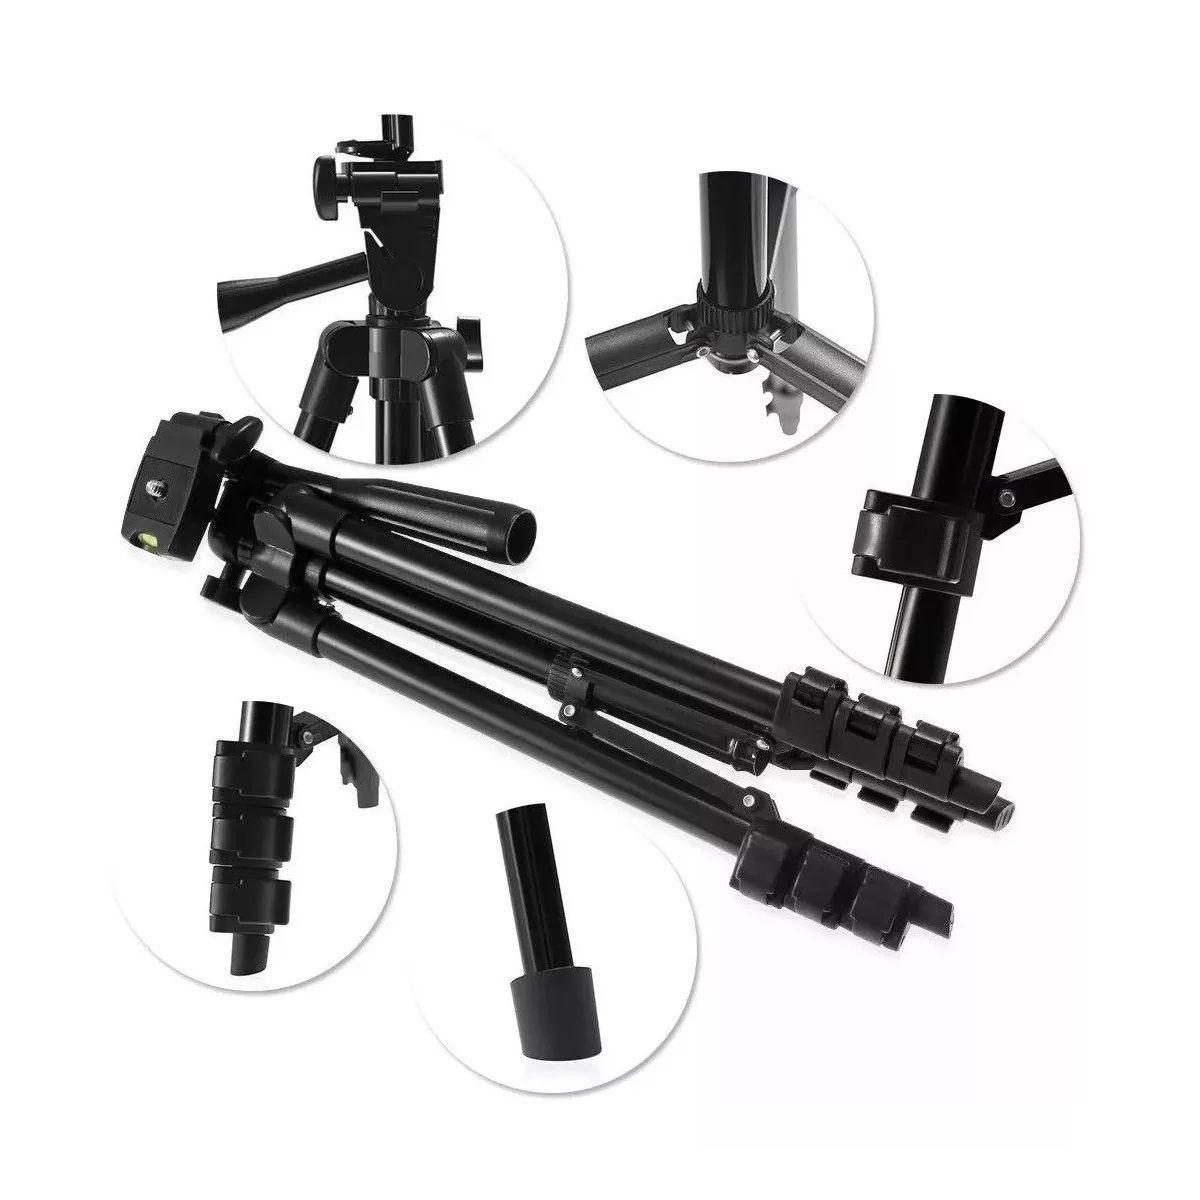 Kit Mochila Para Câmera Profissional + Tripé Telescópico Profissional 1,2m - VMB II + SL-2111H